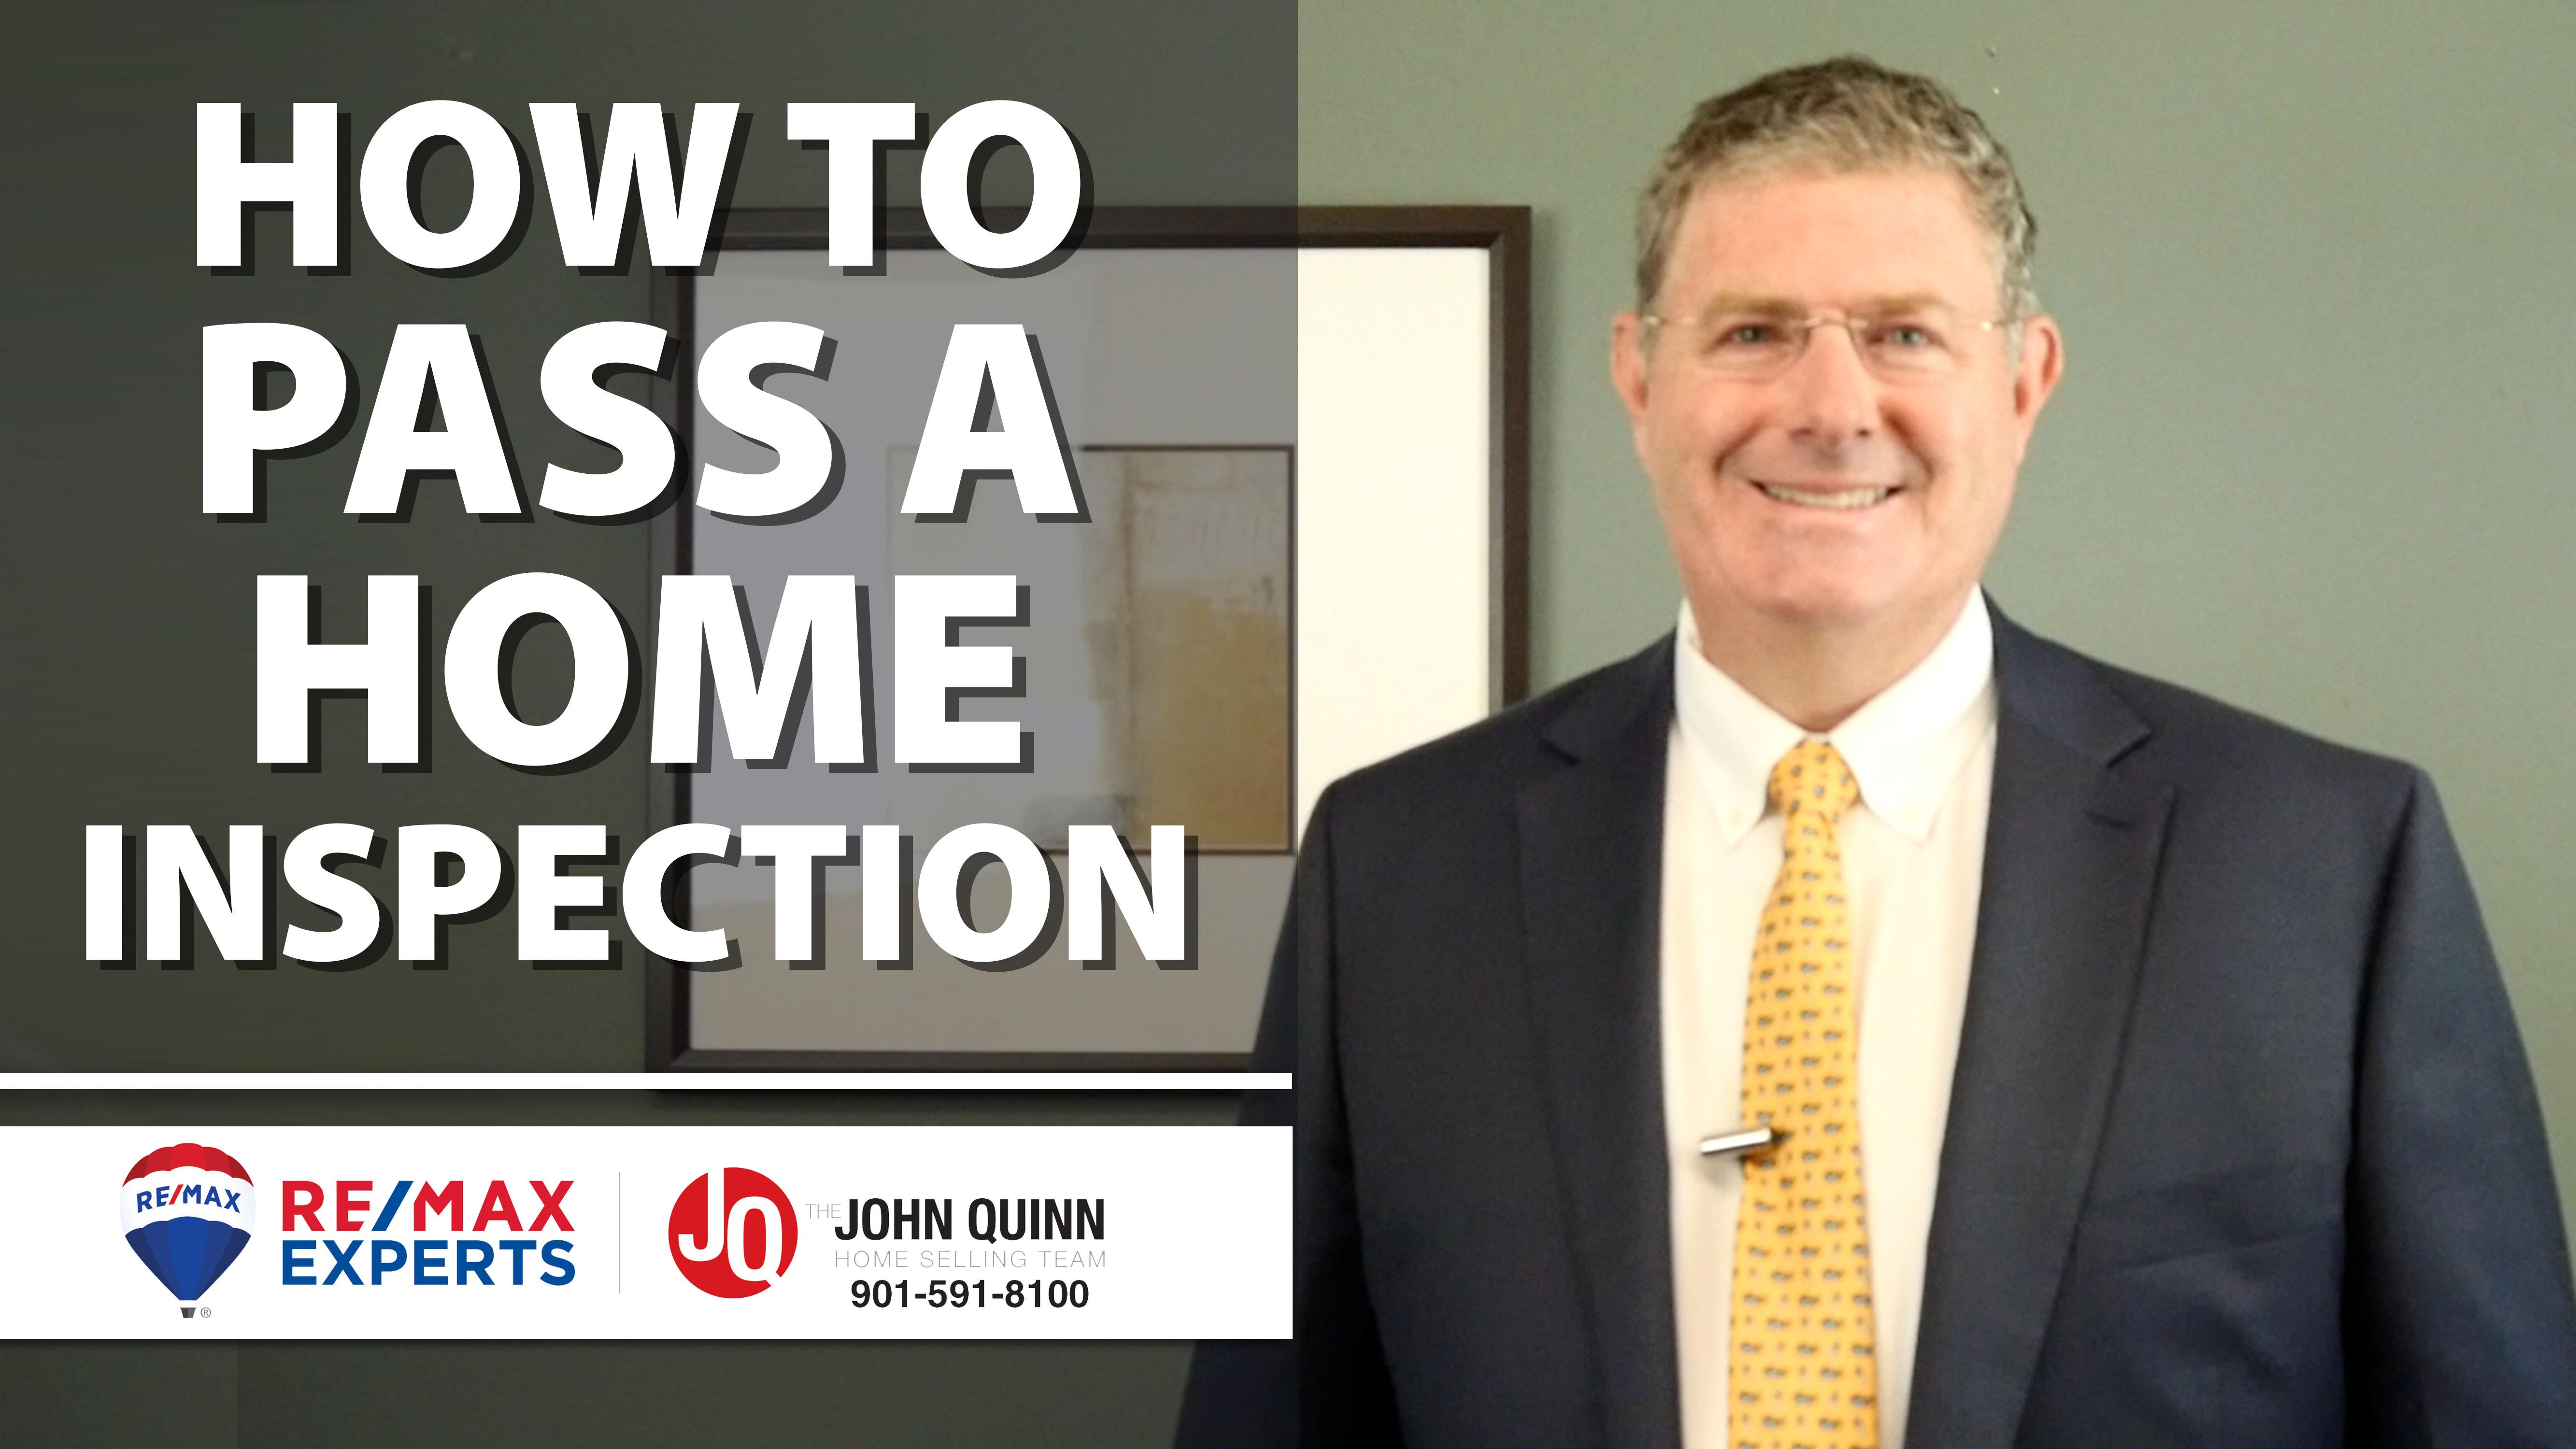 Q: How Do You Pass a Home Inspection?